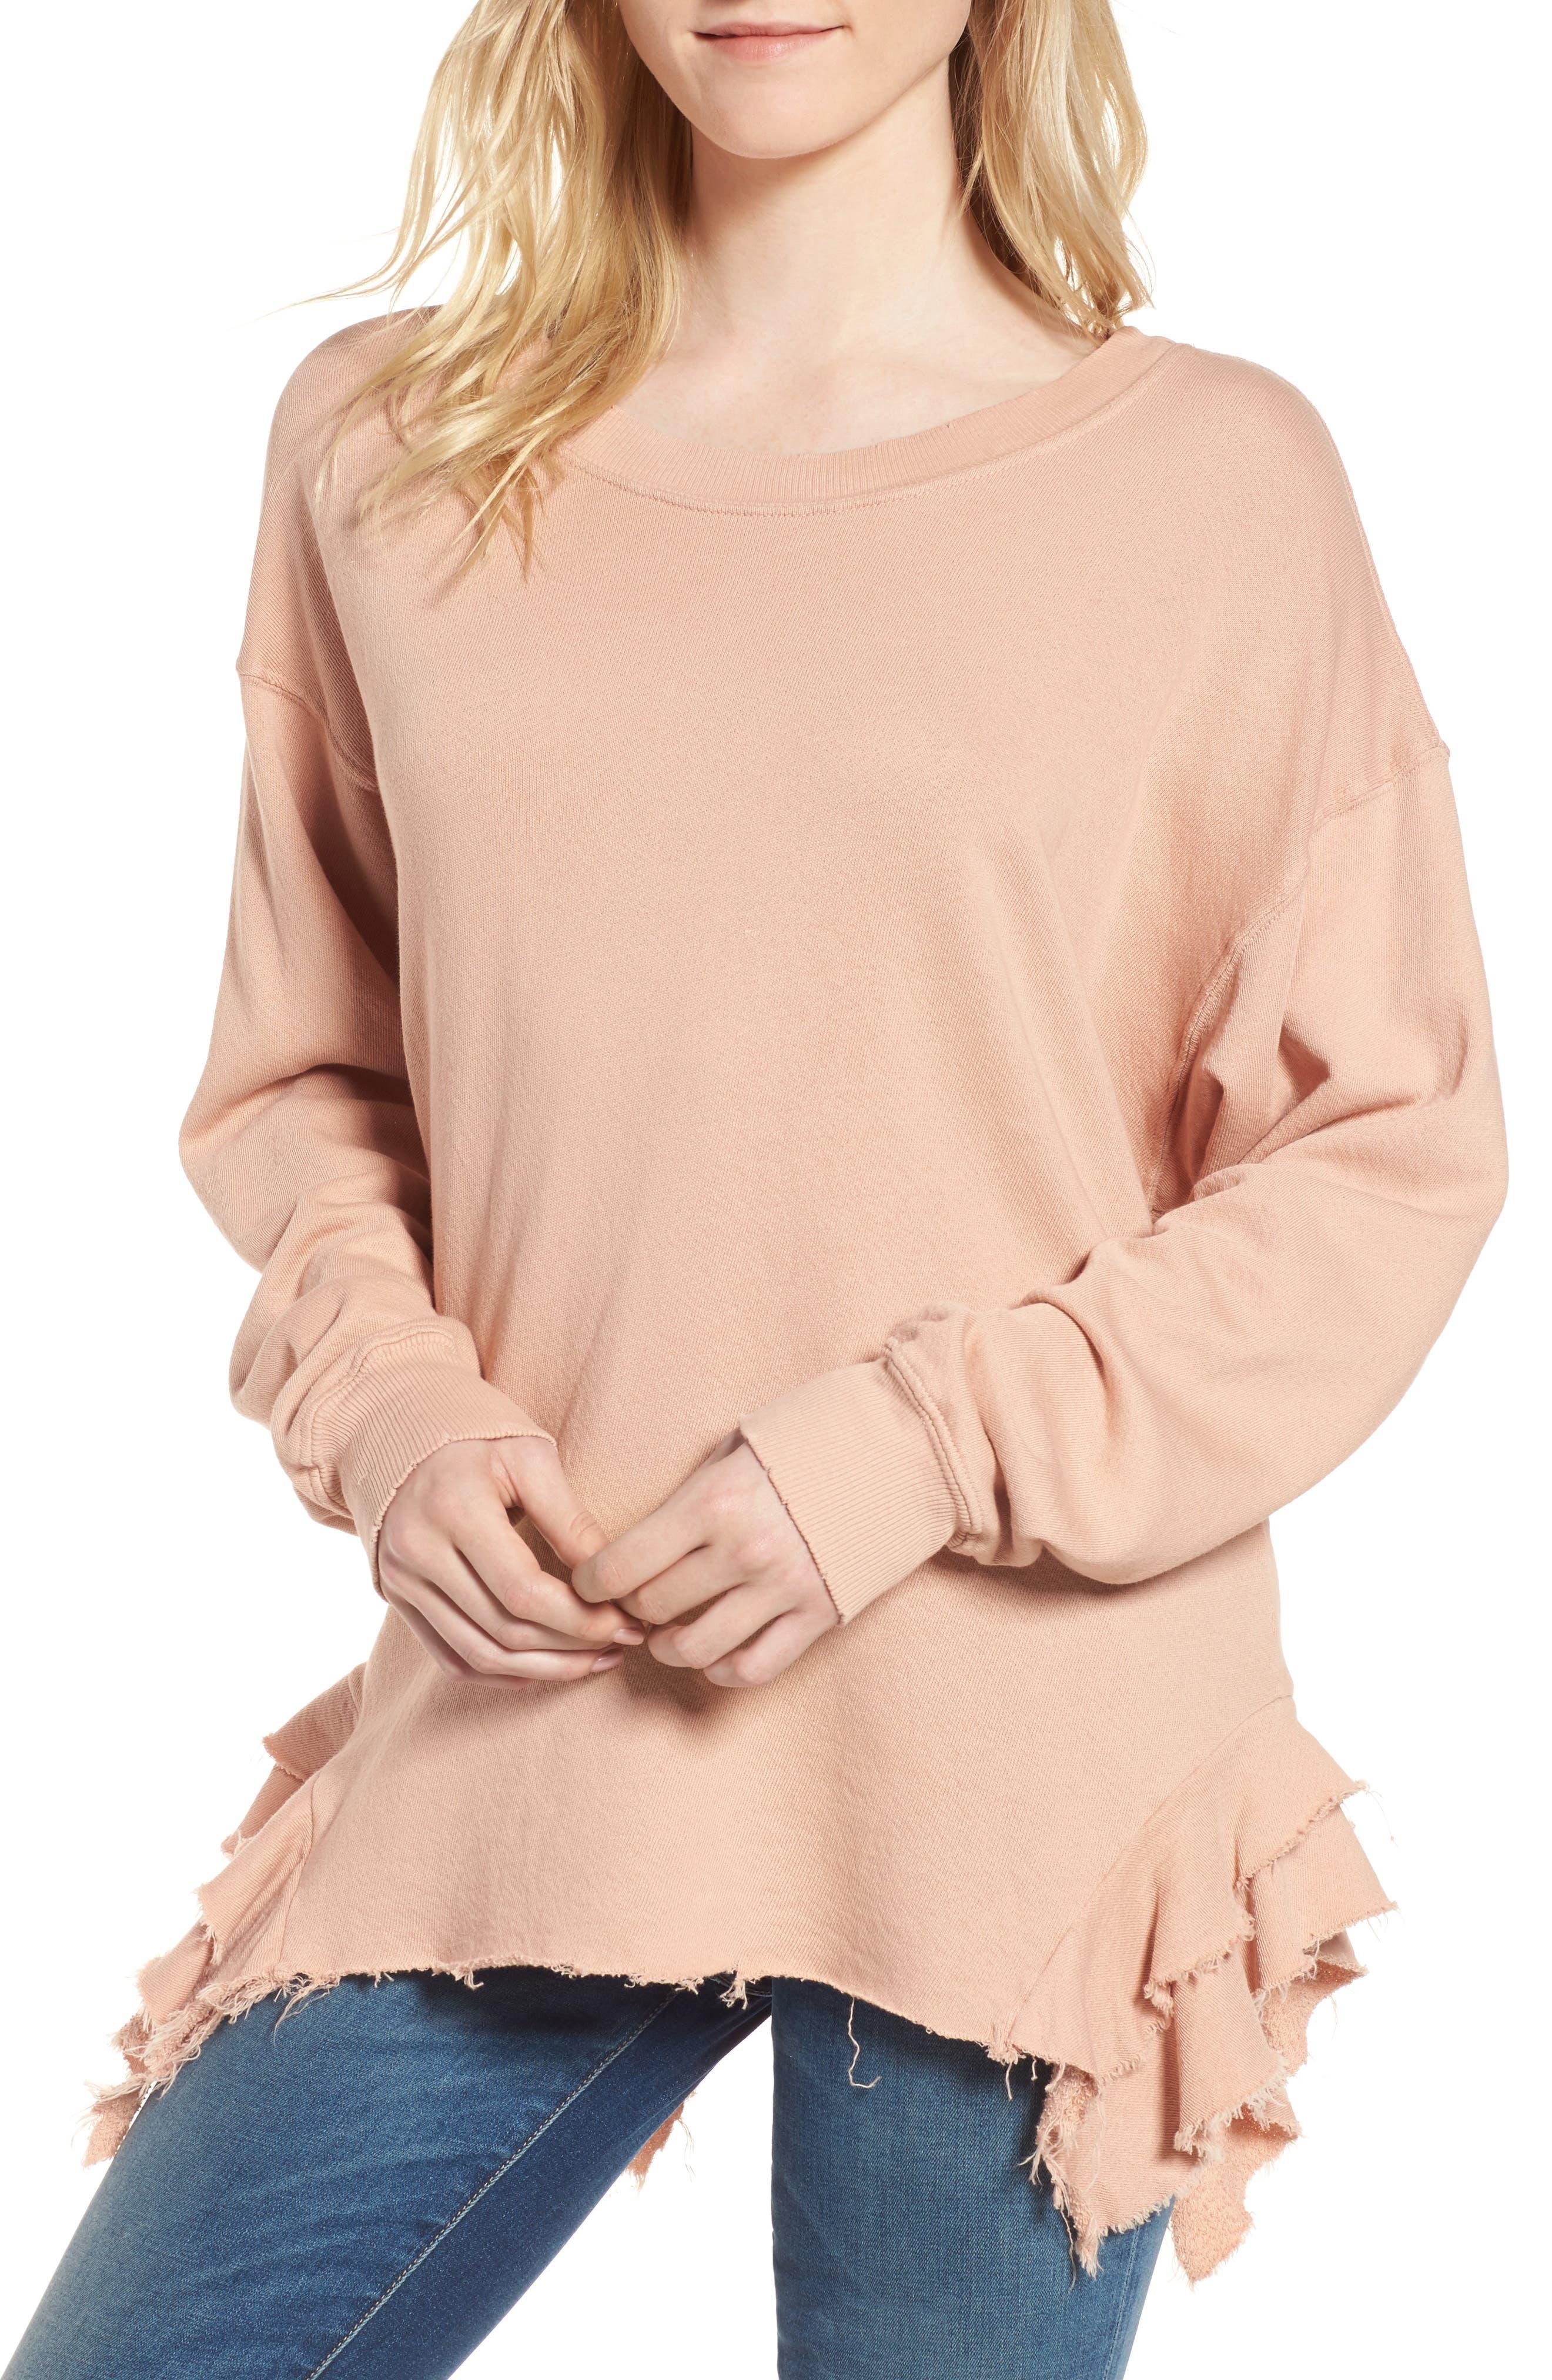 Main Image - Current/Elliott The Slouchy Ruffle Sweatshirt